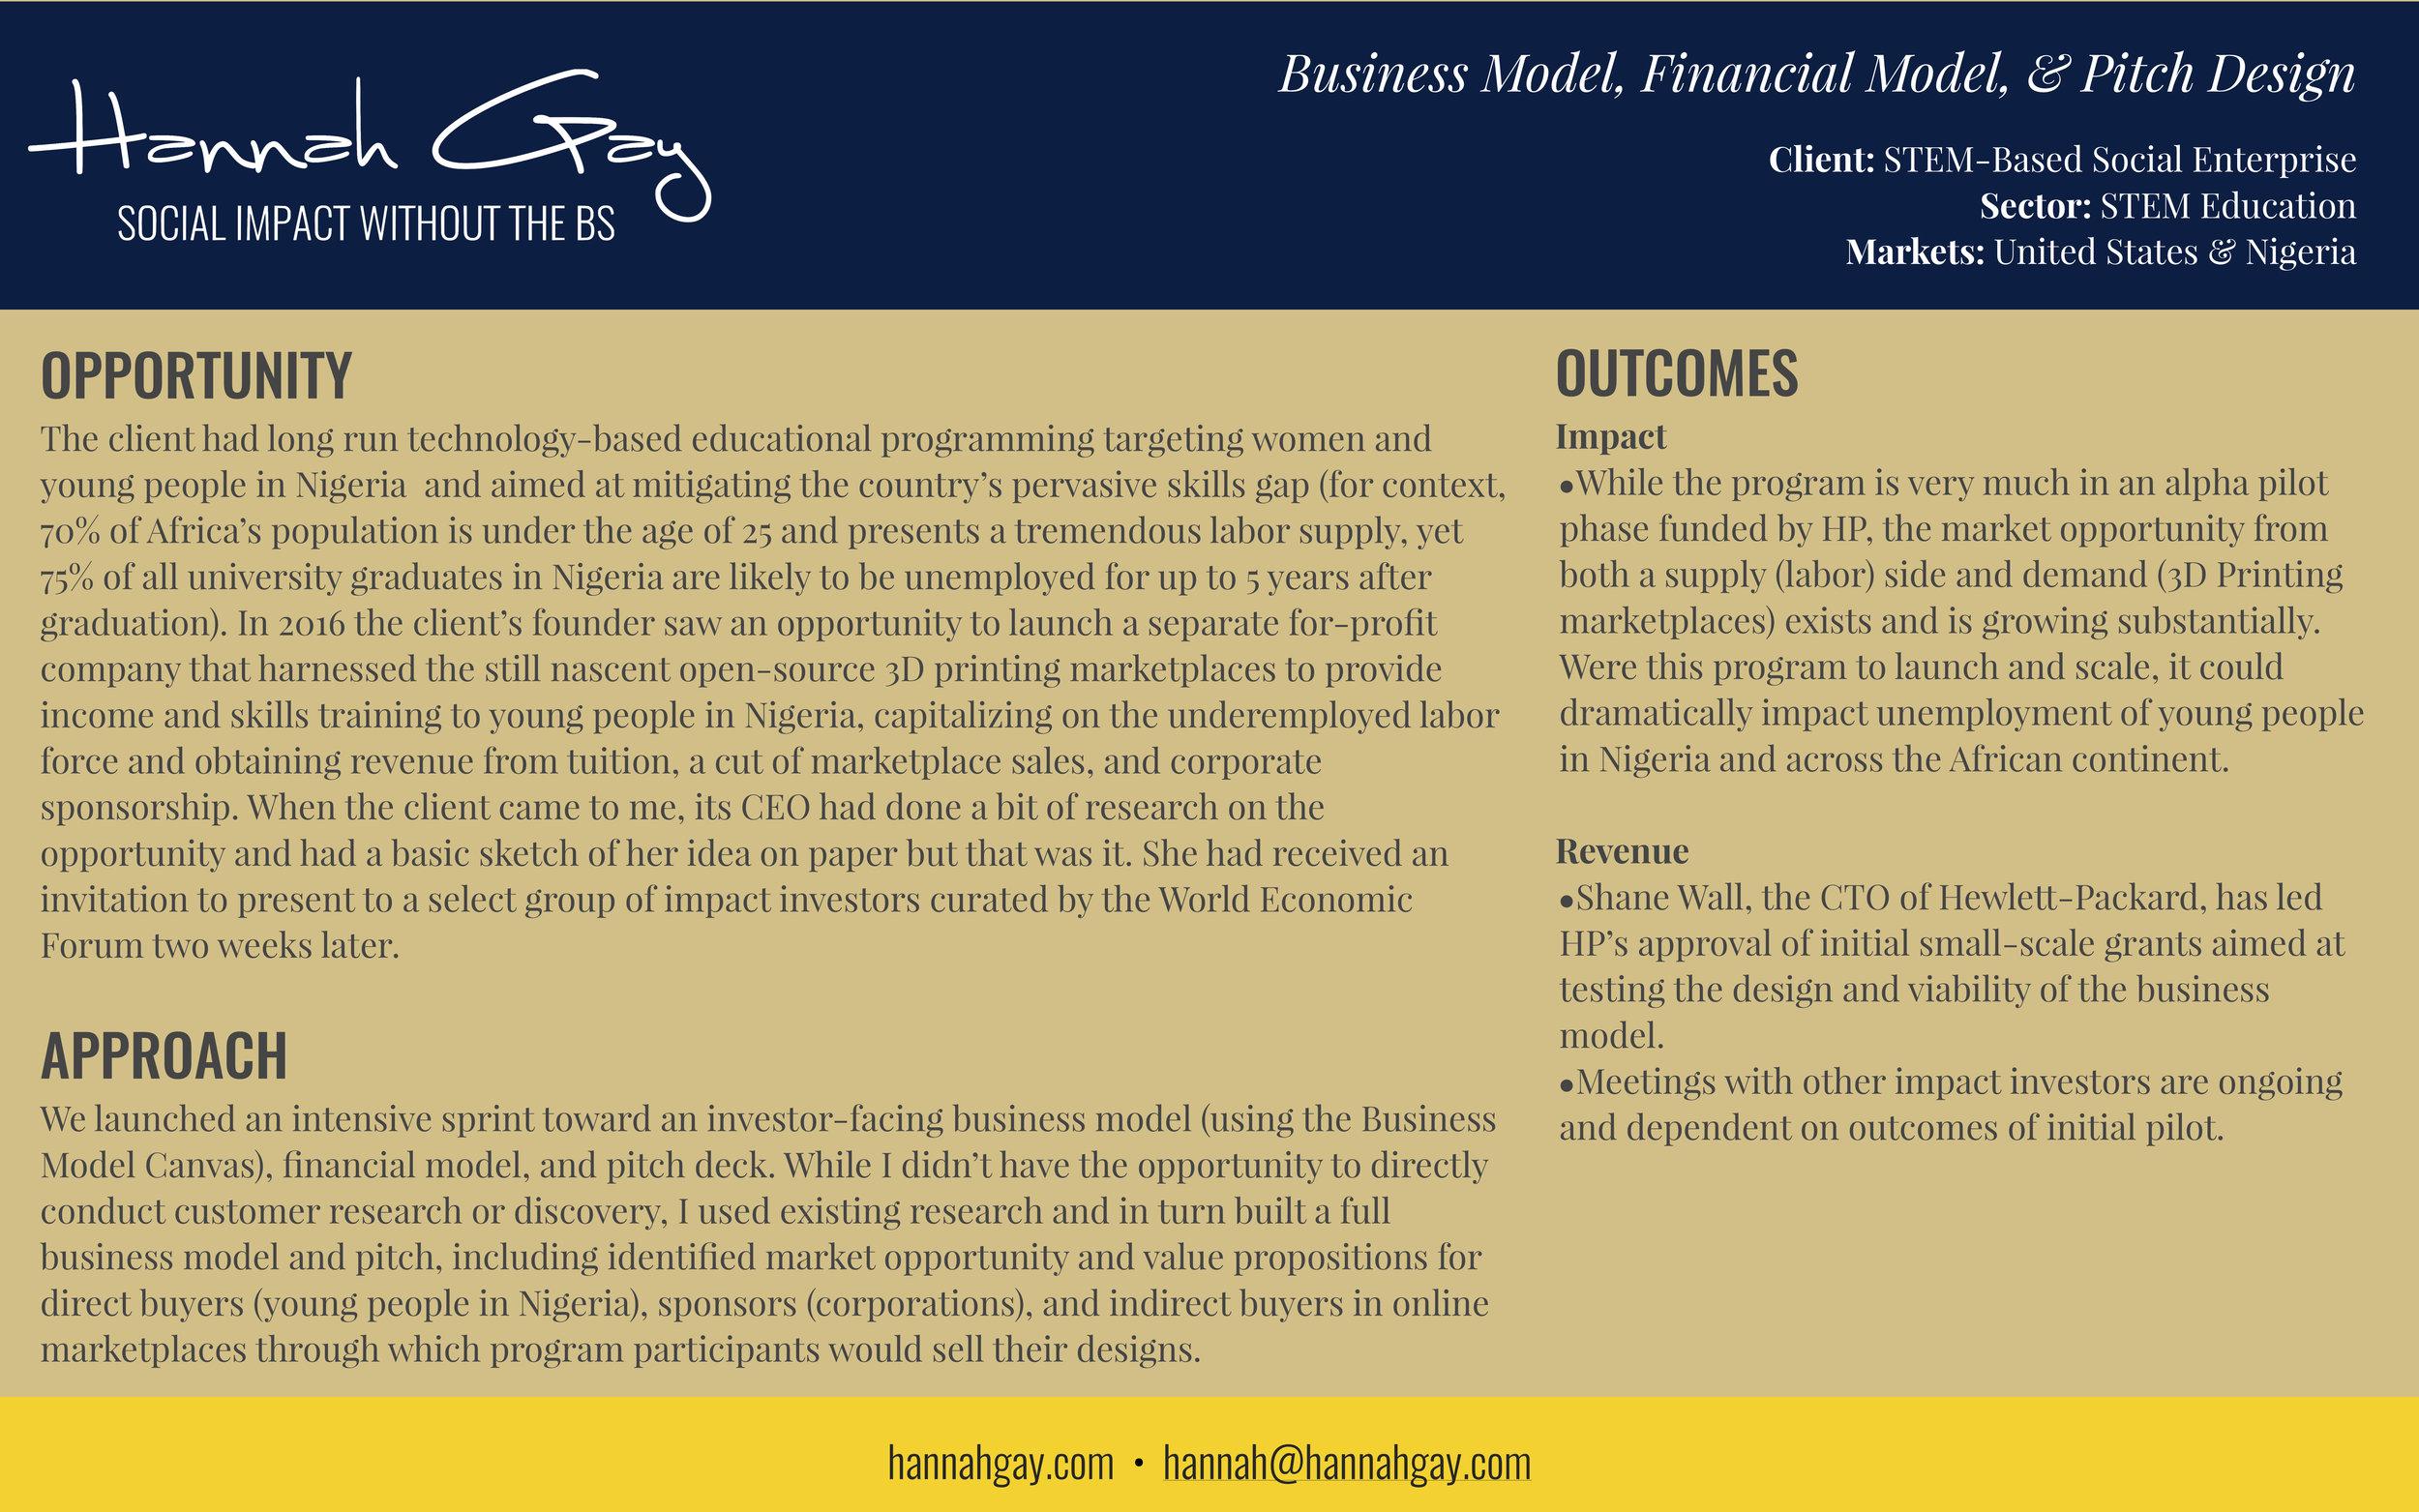 Business Model, Financial Model, & Pitch Design.jpg